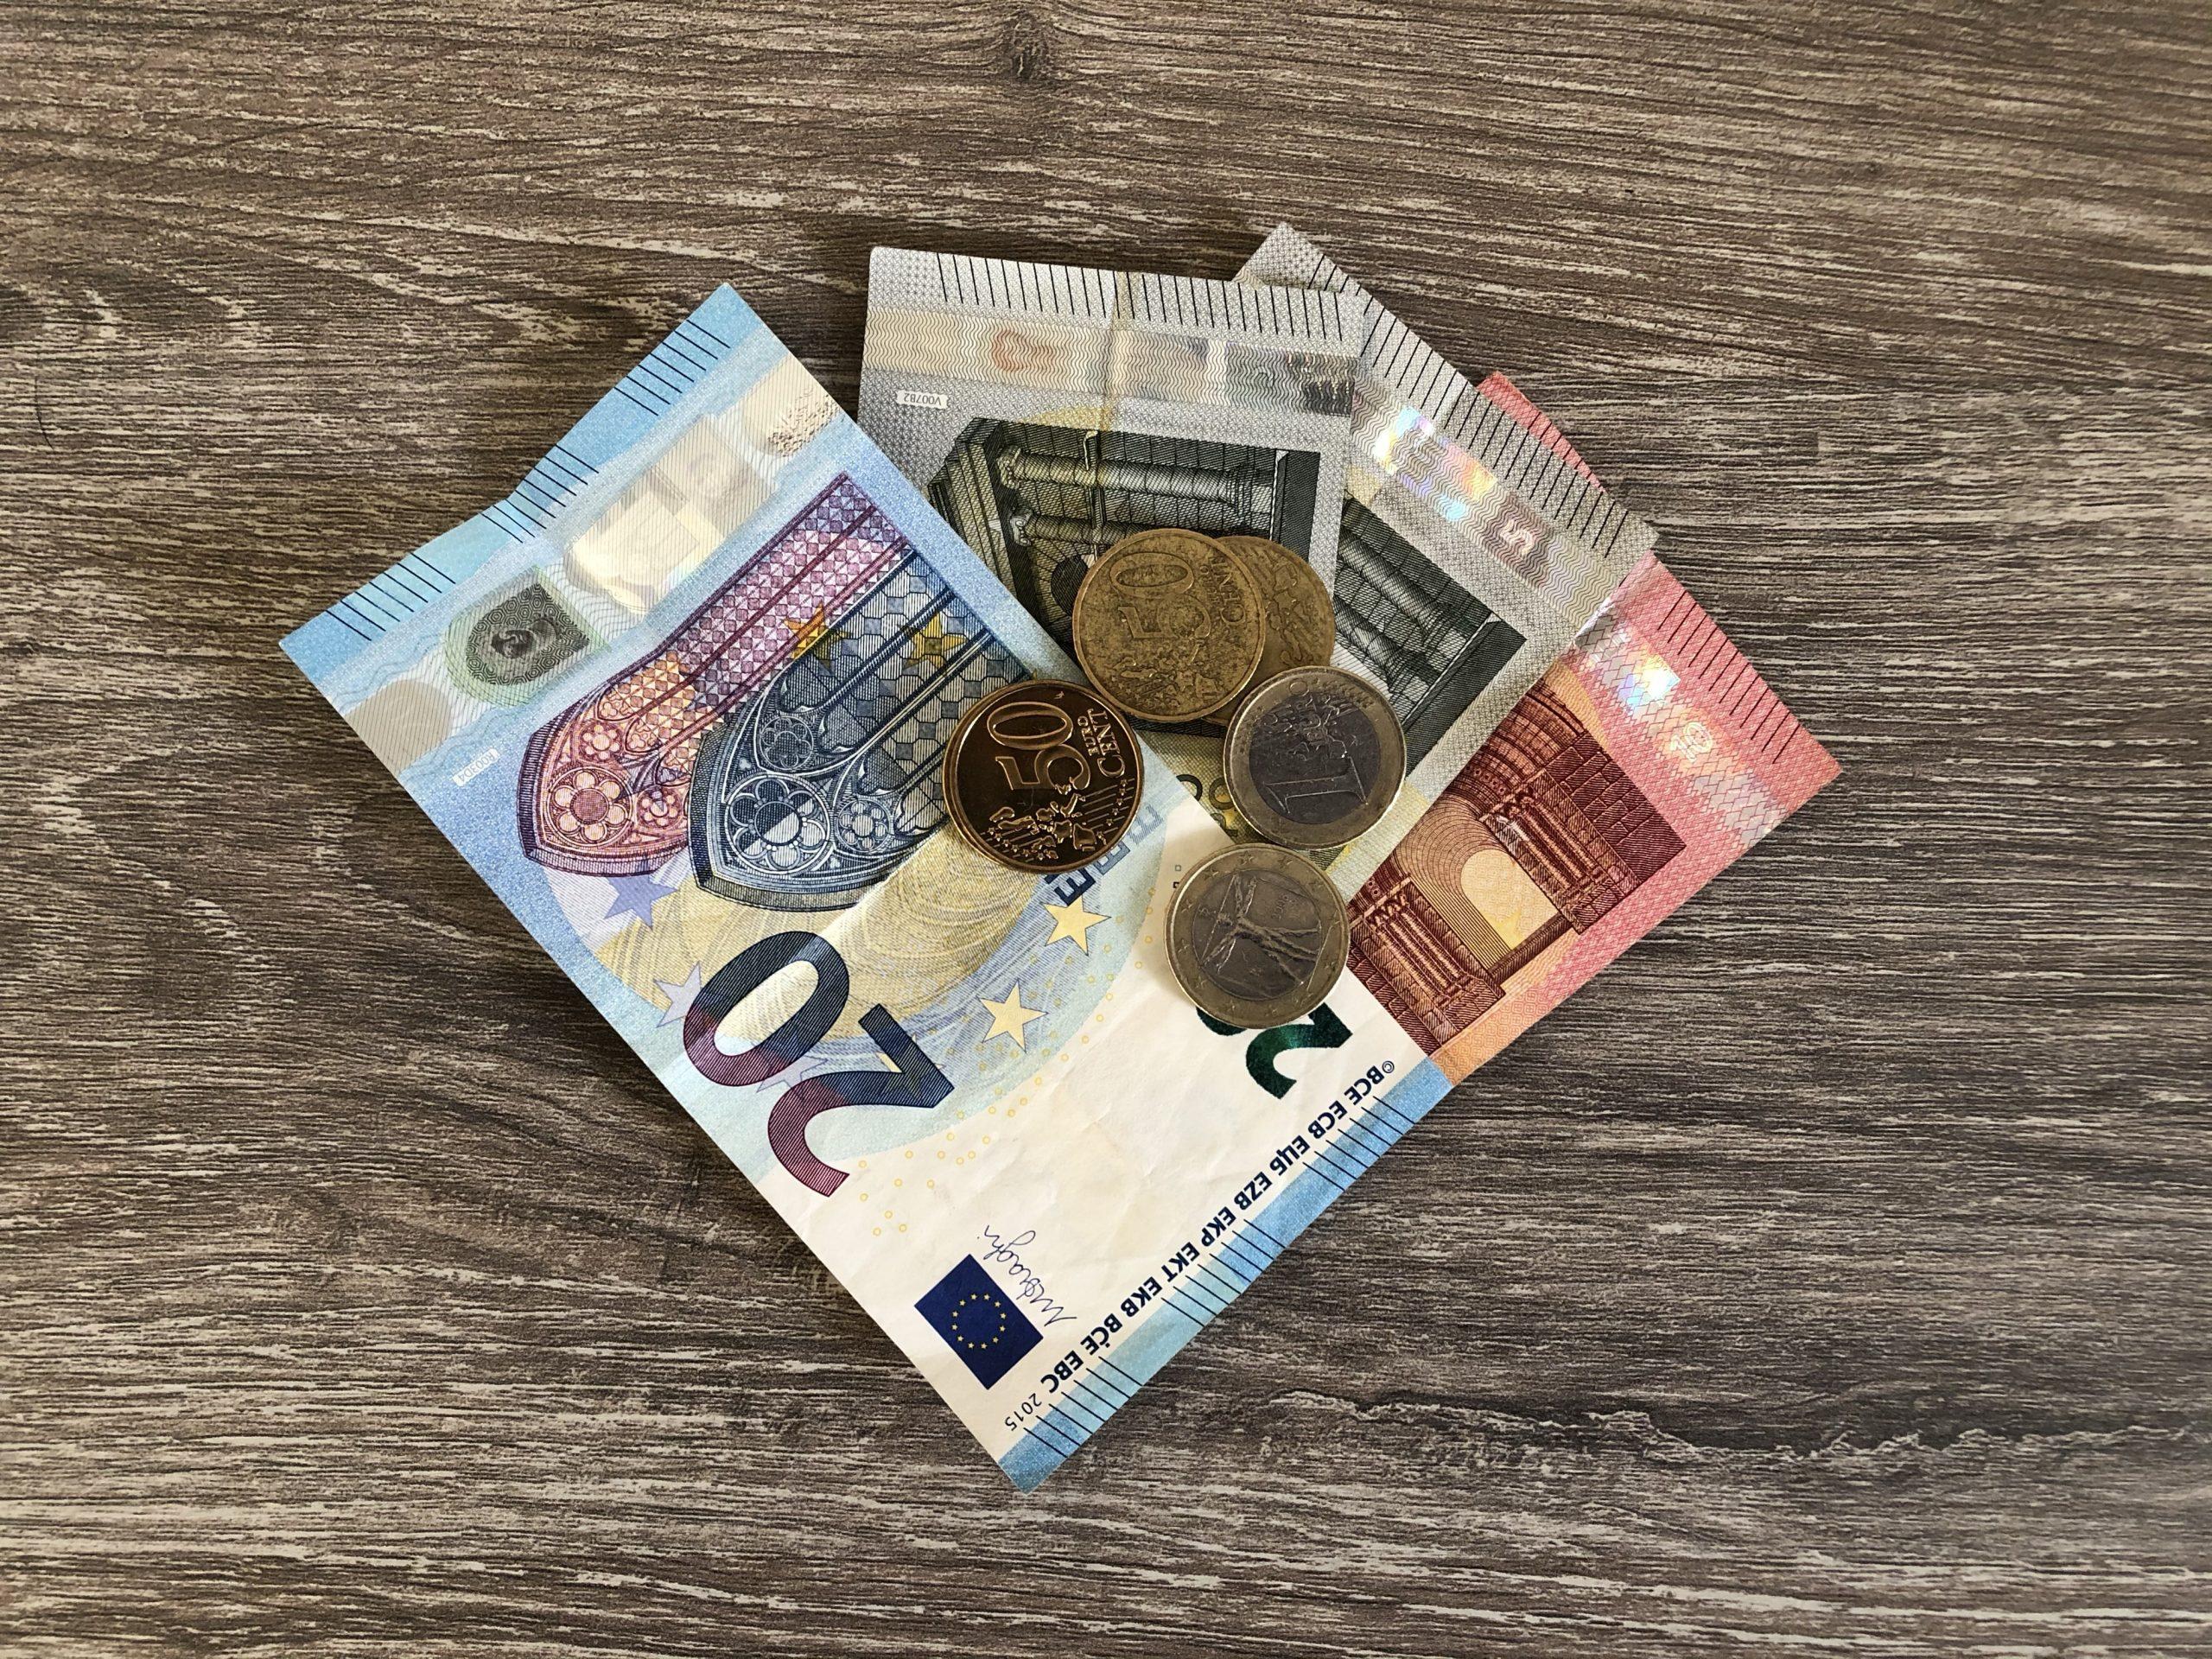 Geld challenge